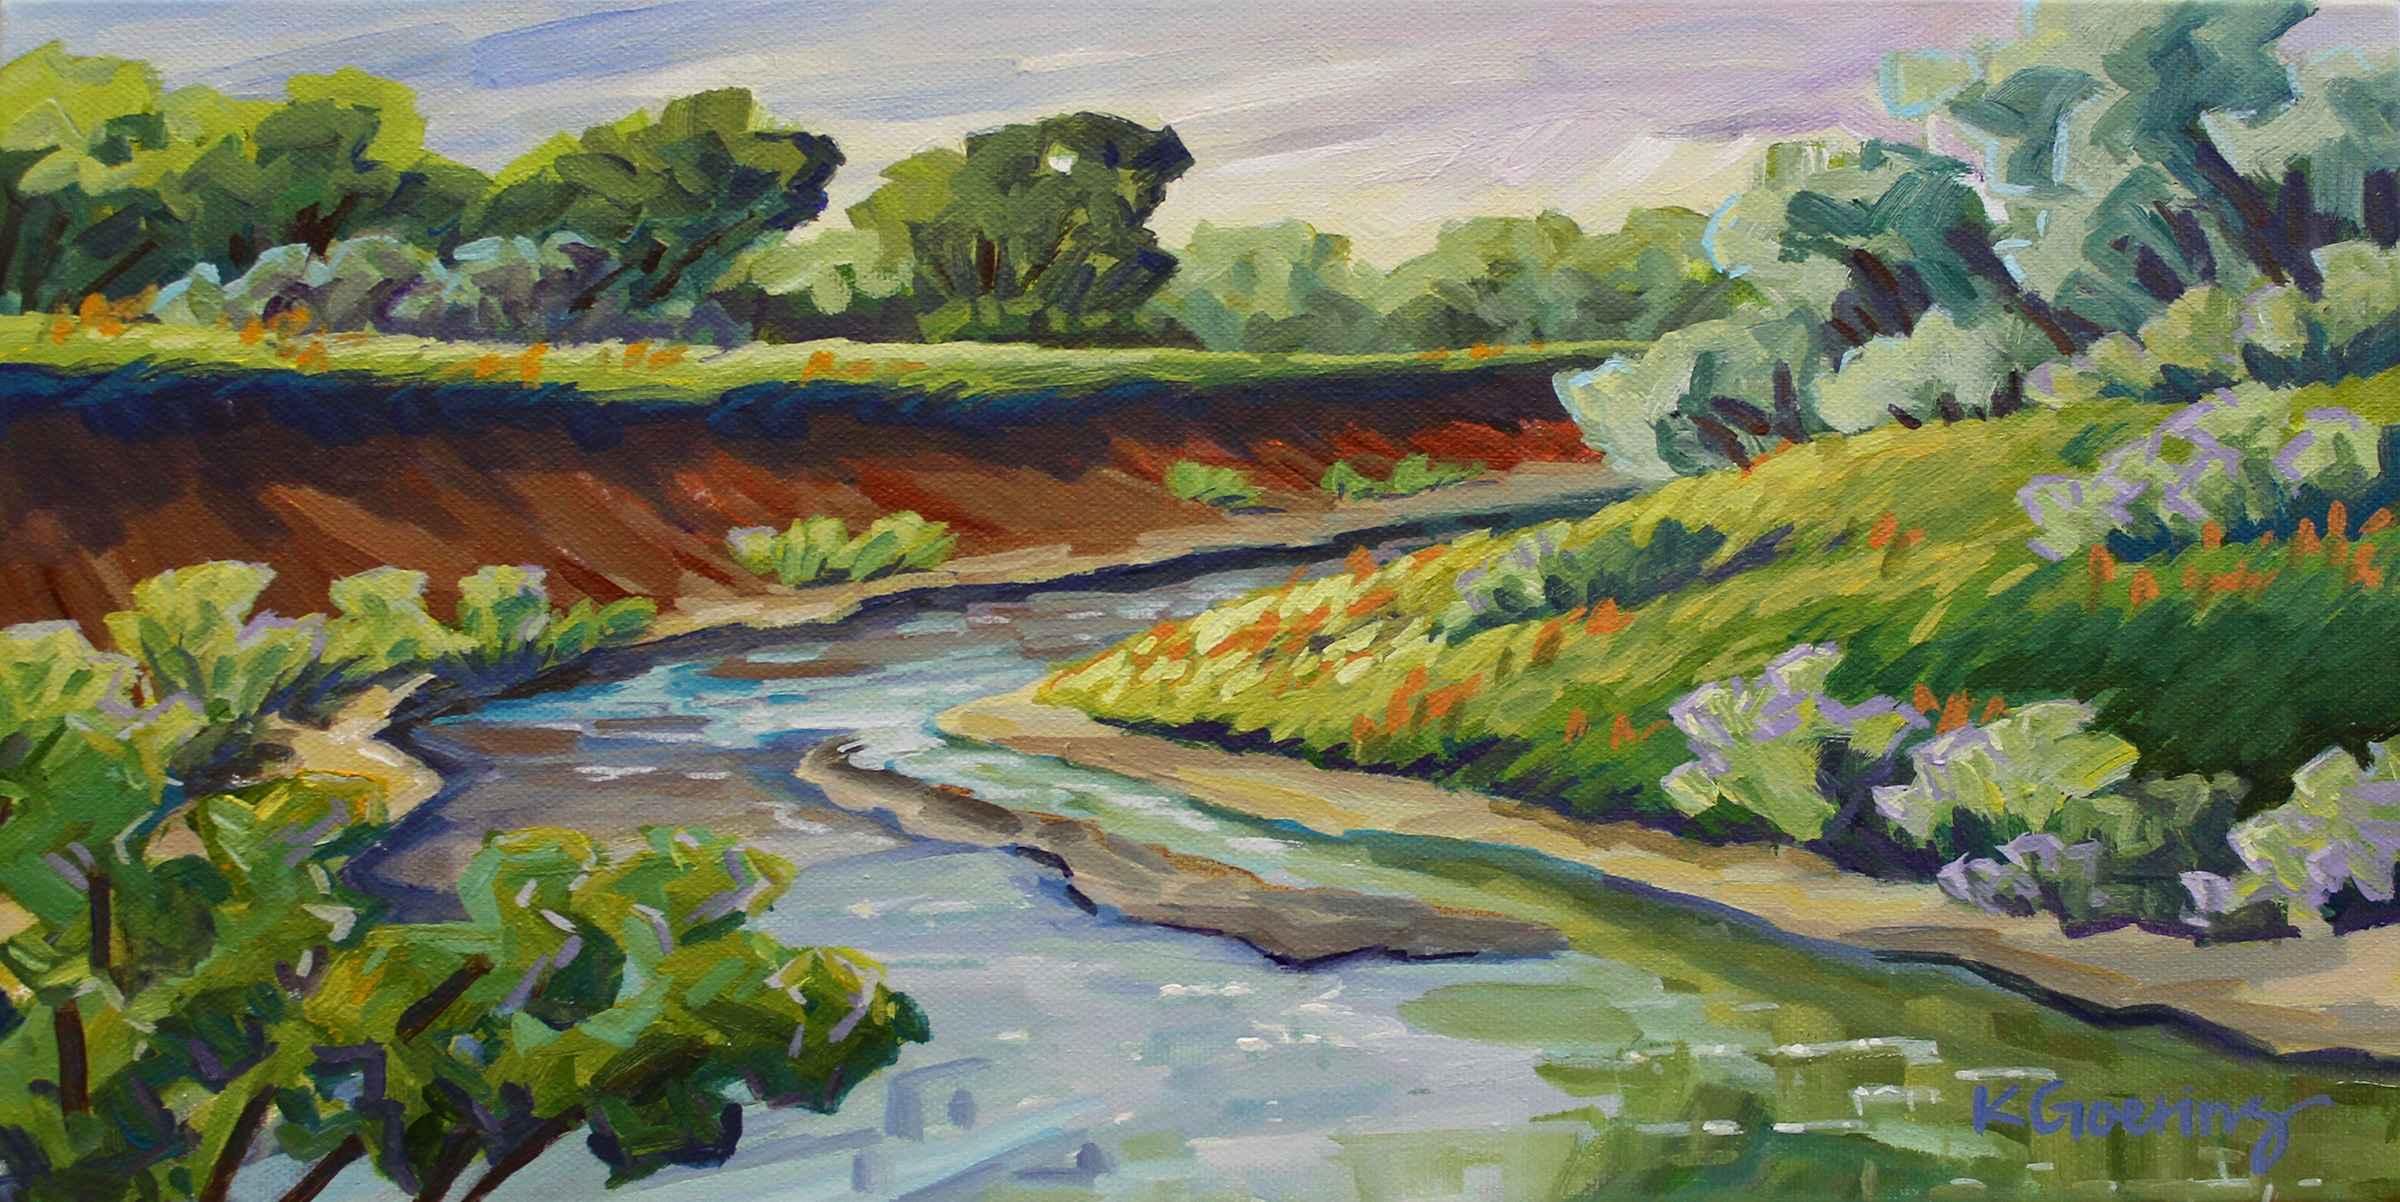 Marais des Cygnes by  Kristin Goering - Masterpiece Online